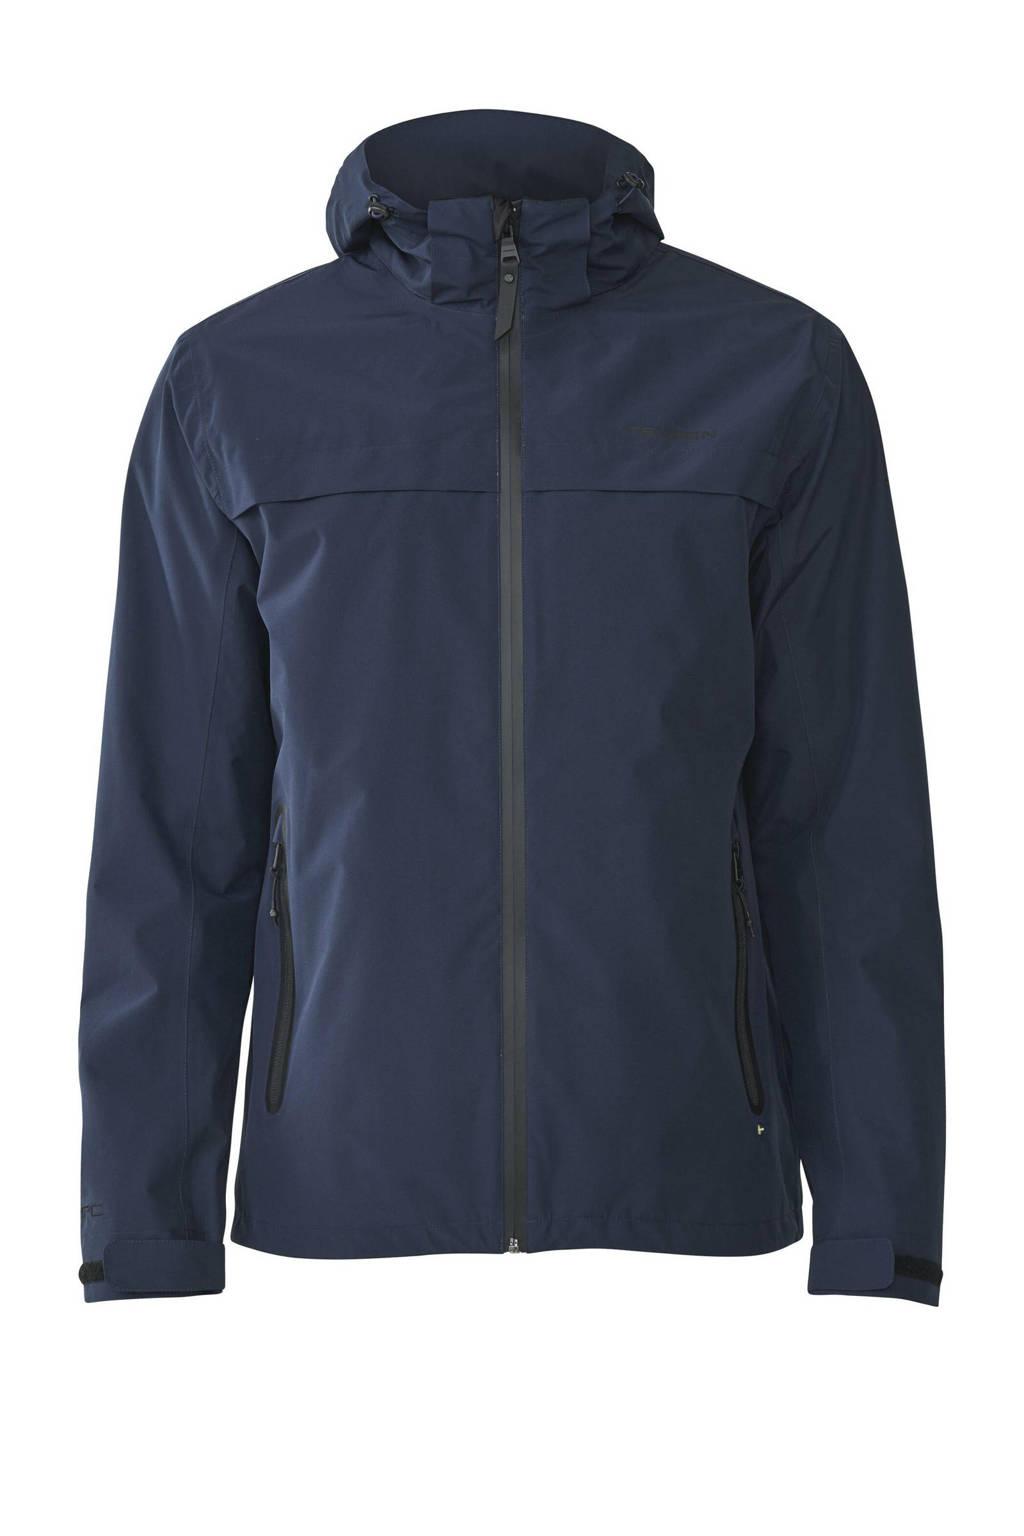 Tenson outdoor jas Ivar donkerblauw, Donkerblauw